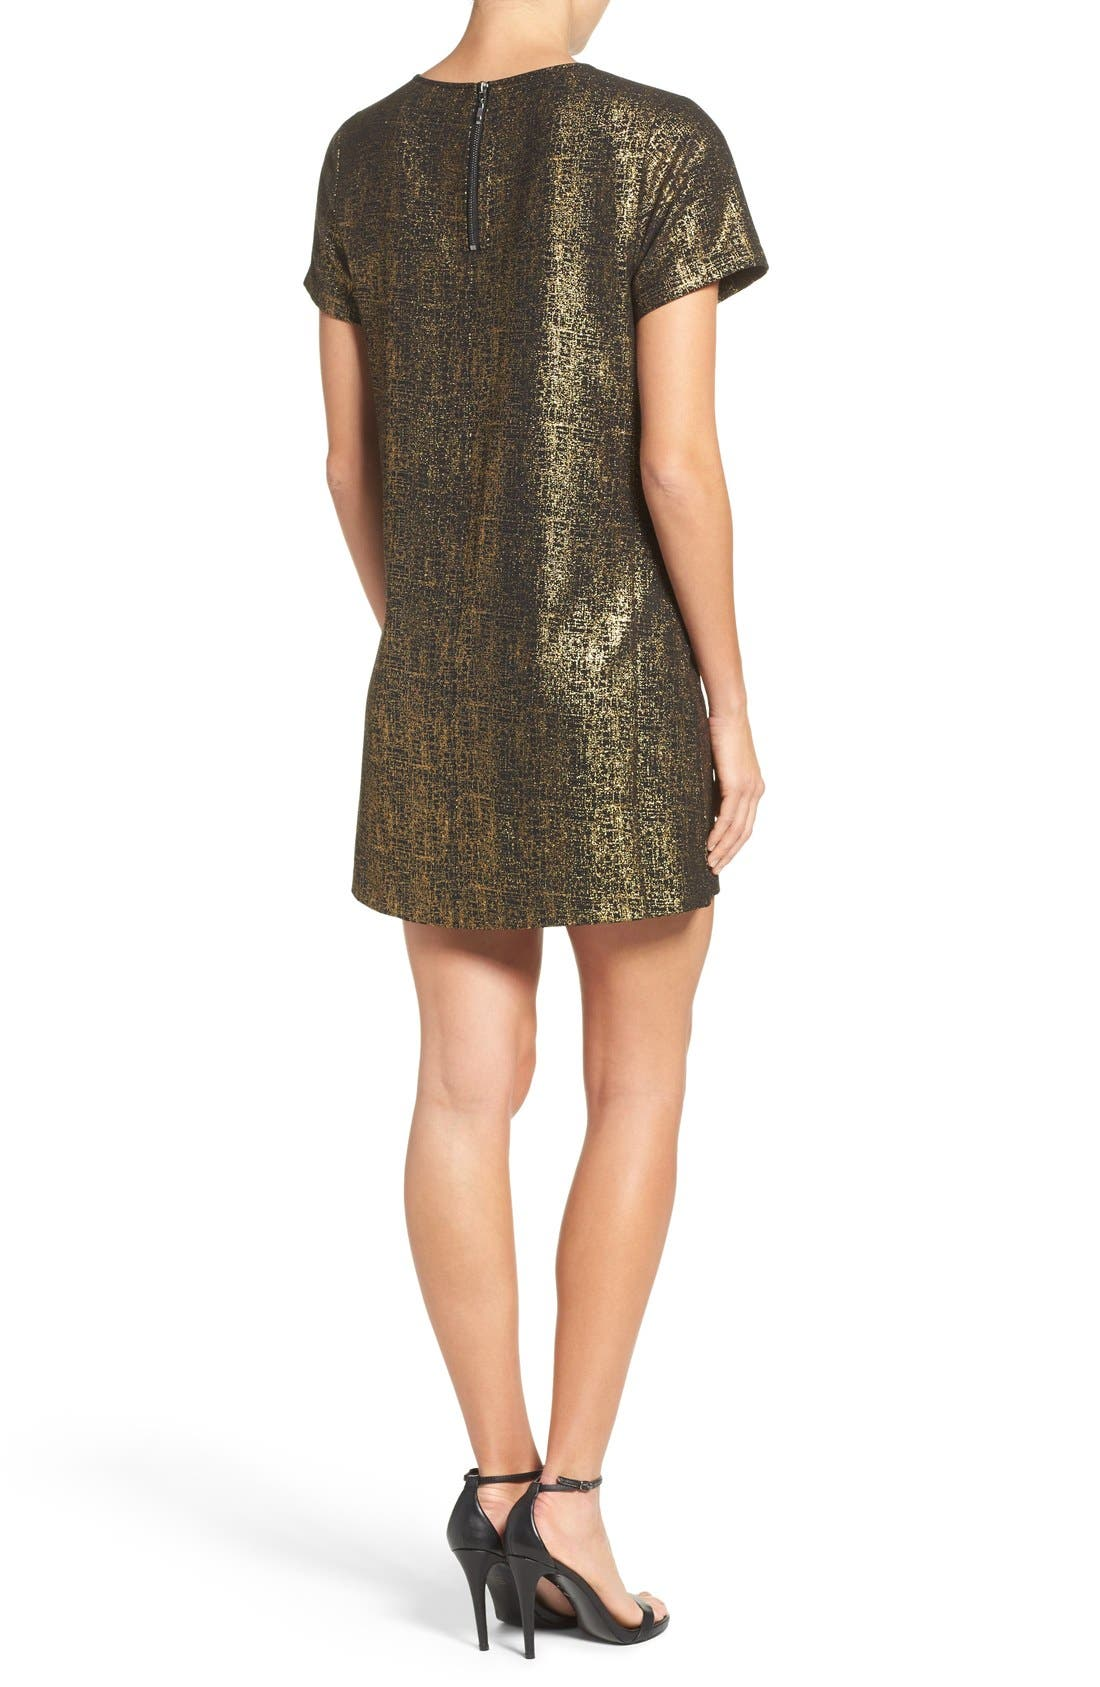 Amy Metallic Shift Dress,                             Alternate thumbnail 2, color,                             Black/ Gold